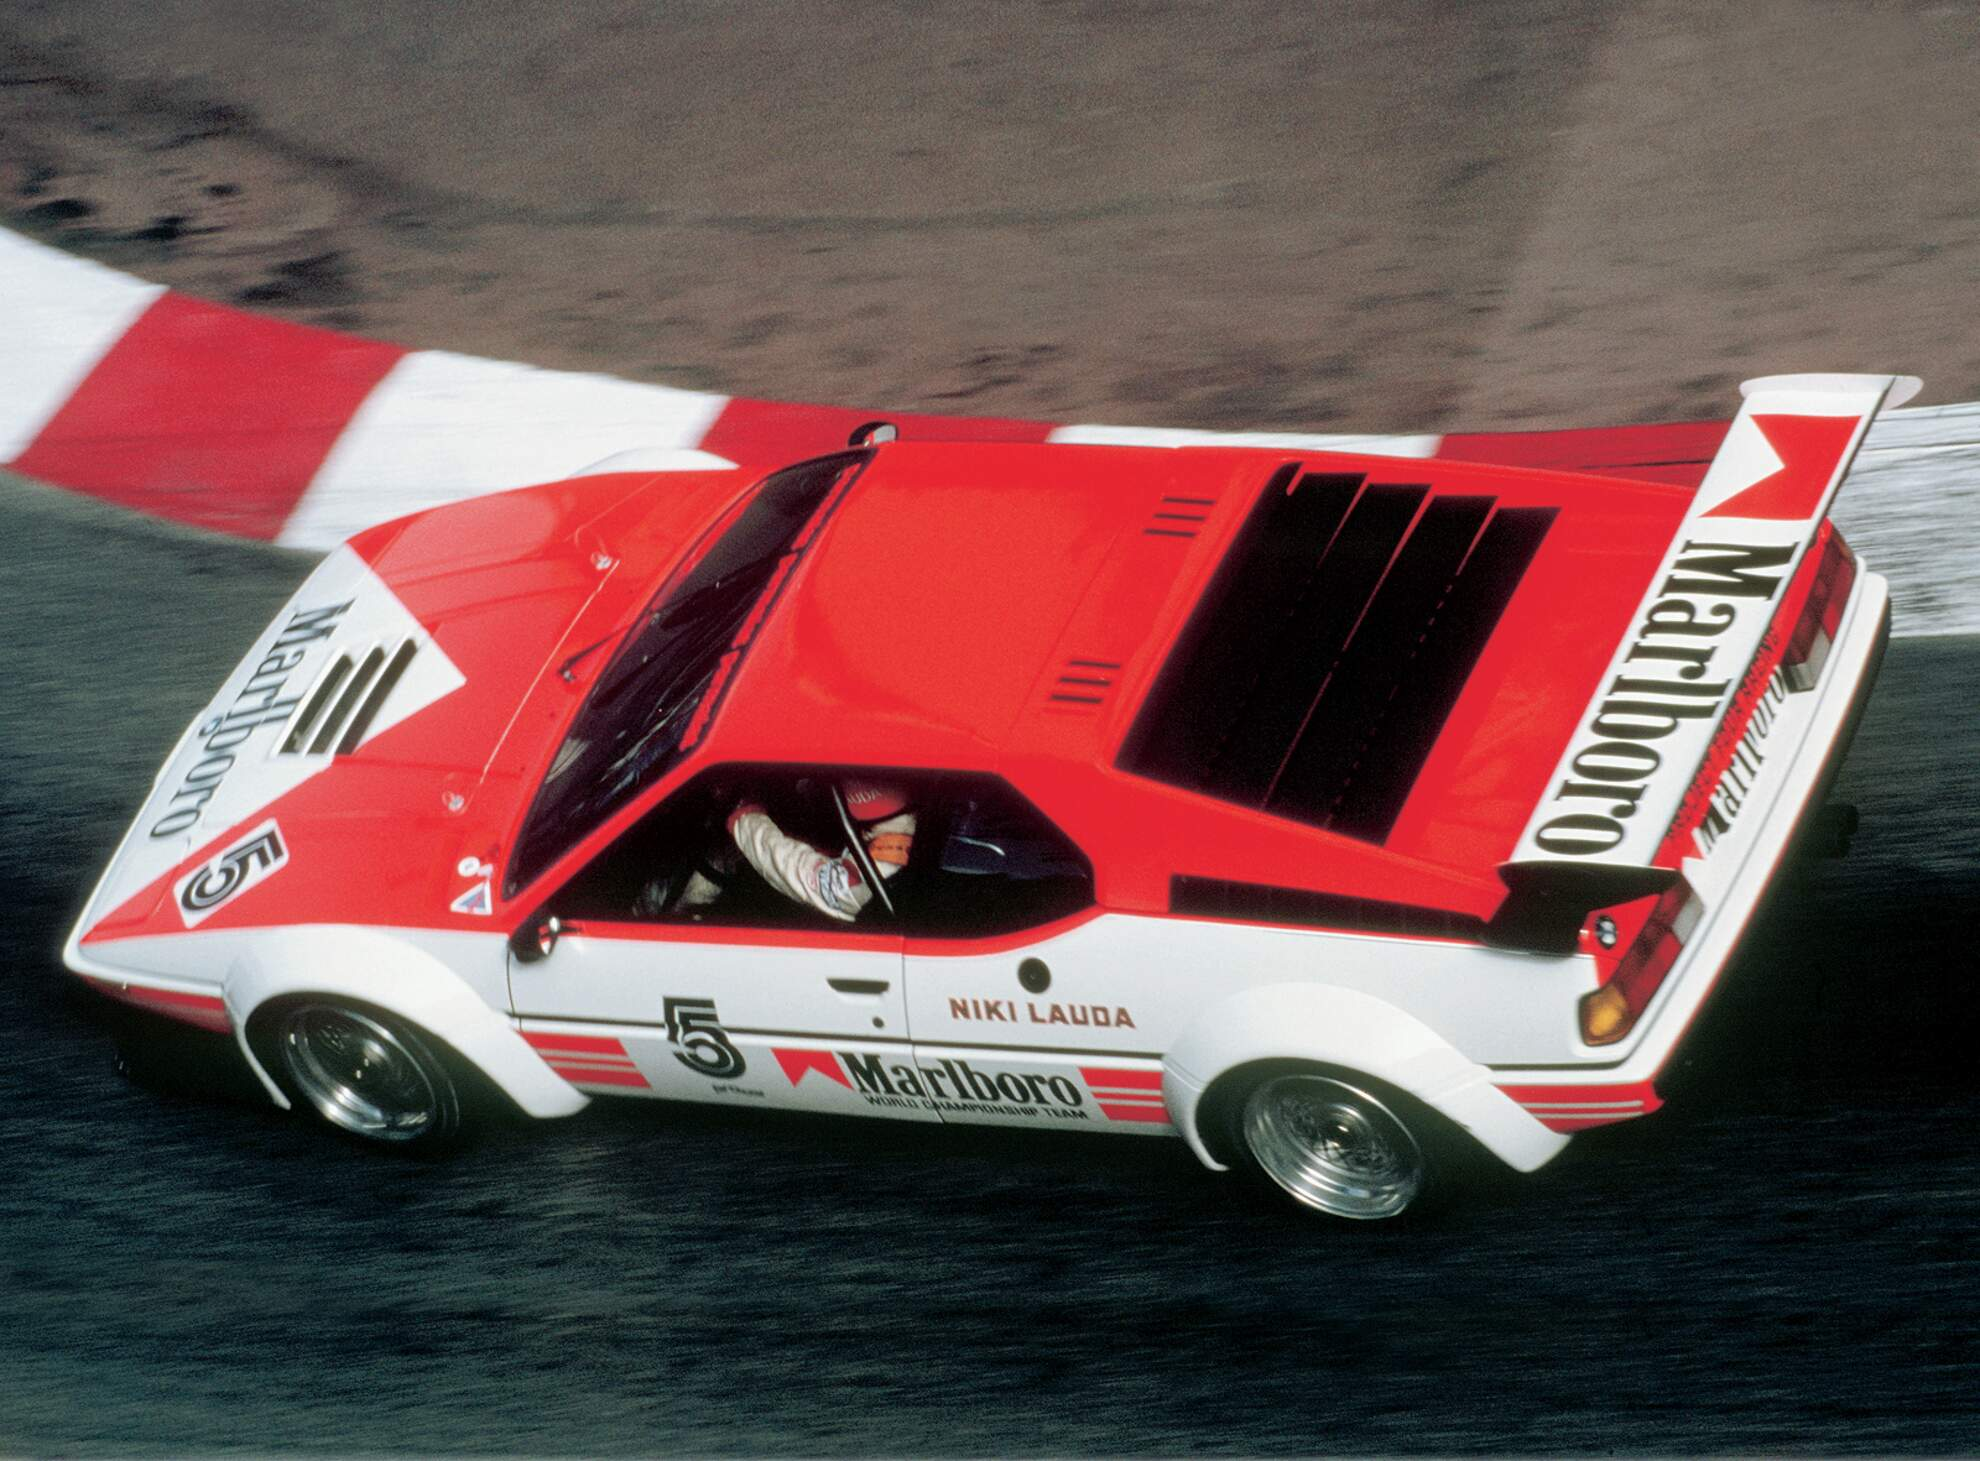 BMW M1 Nicki Lauda